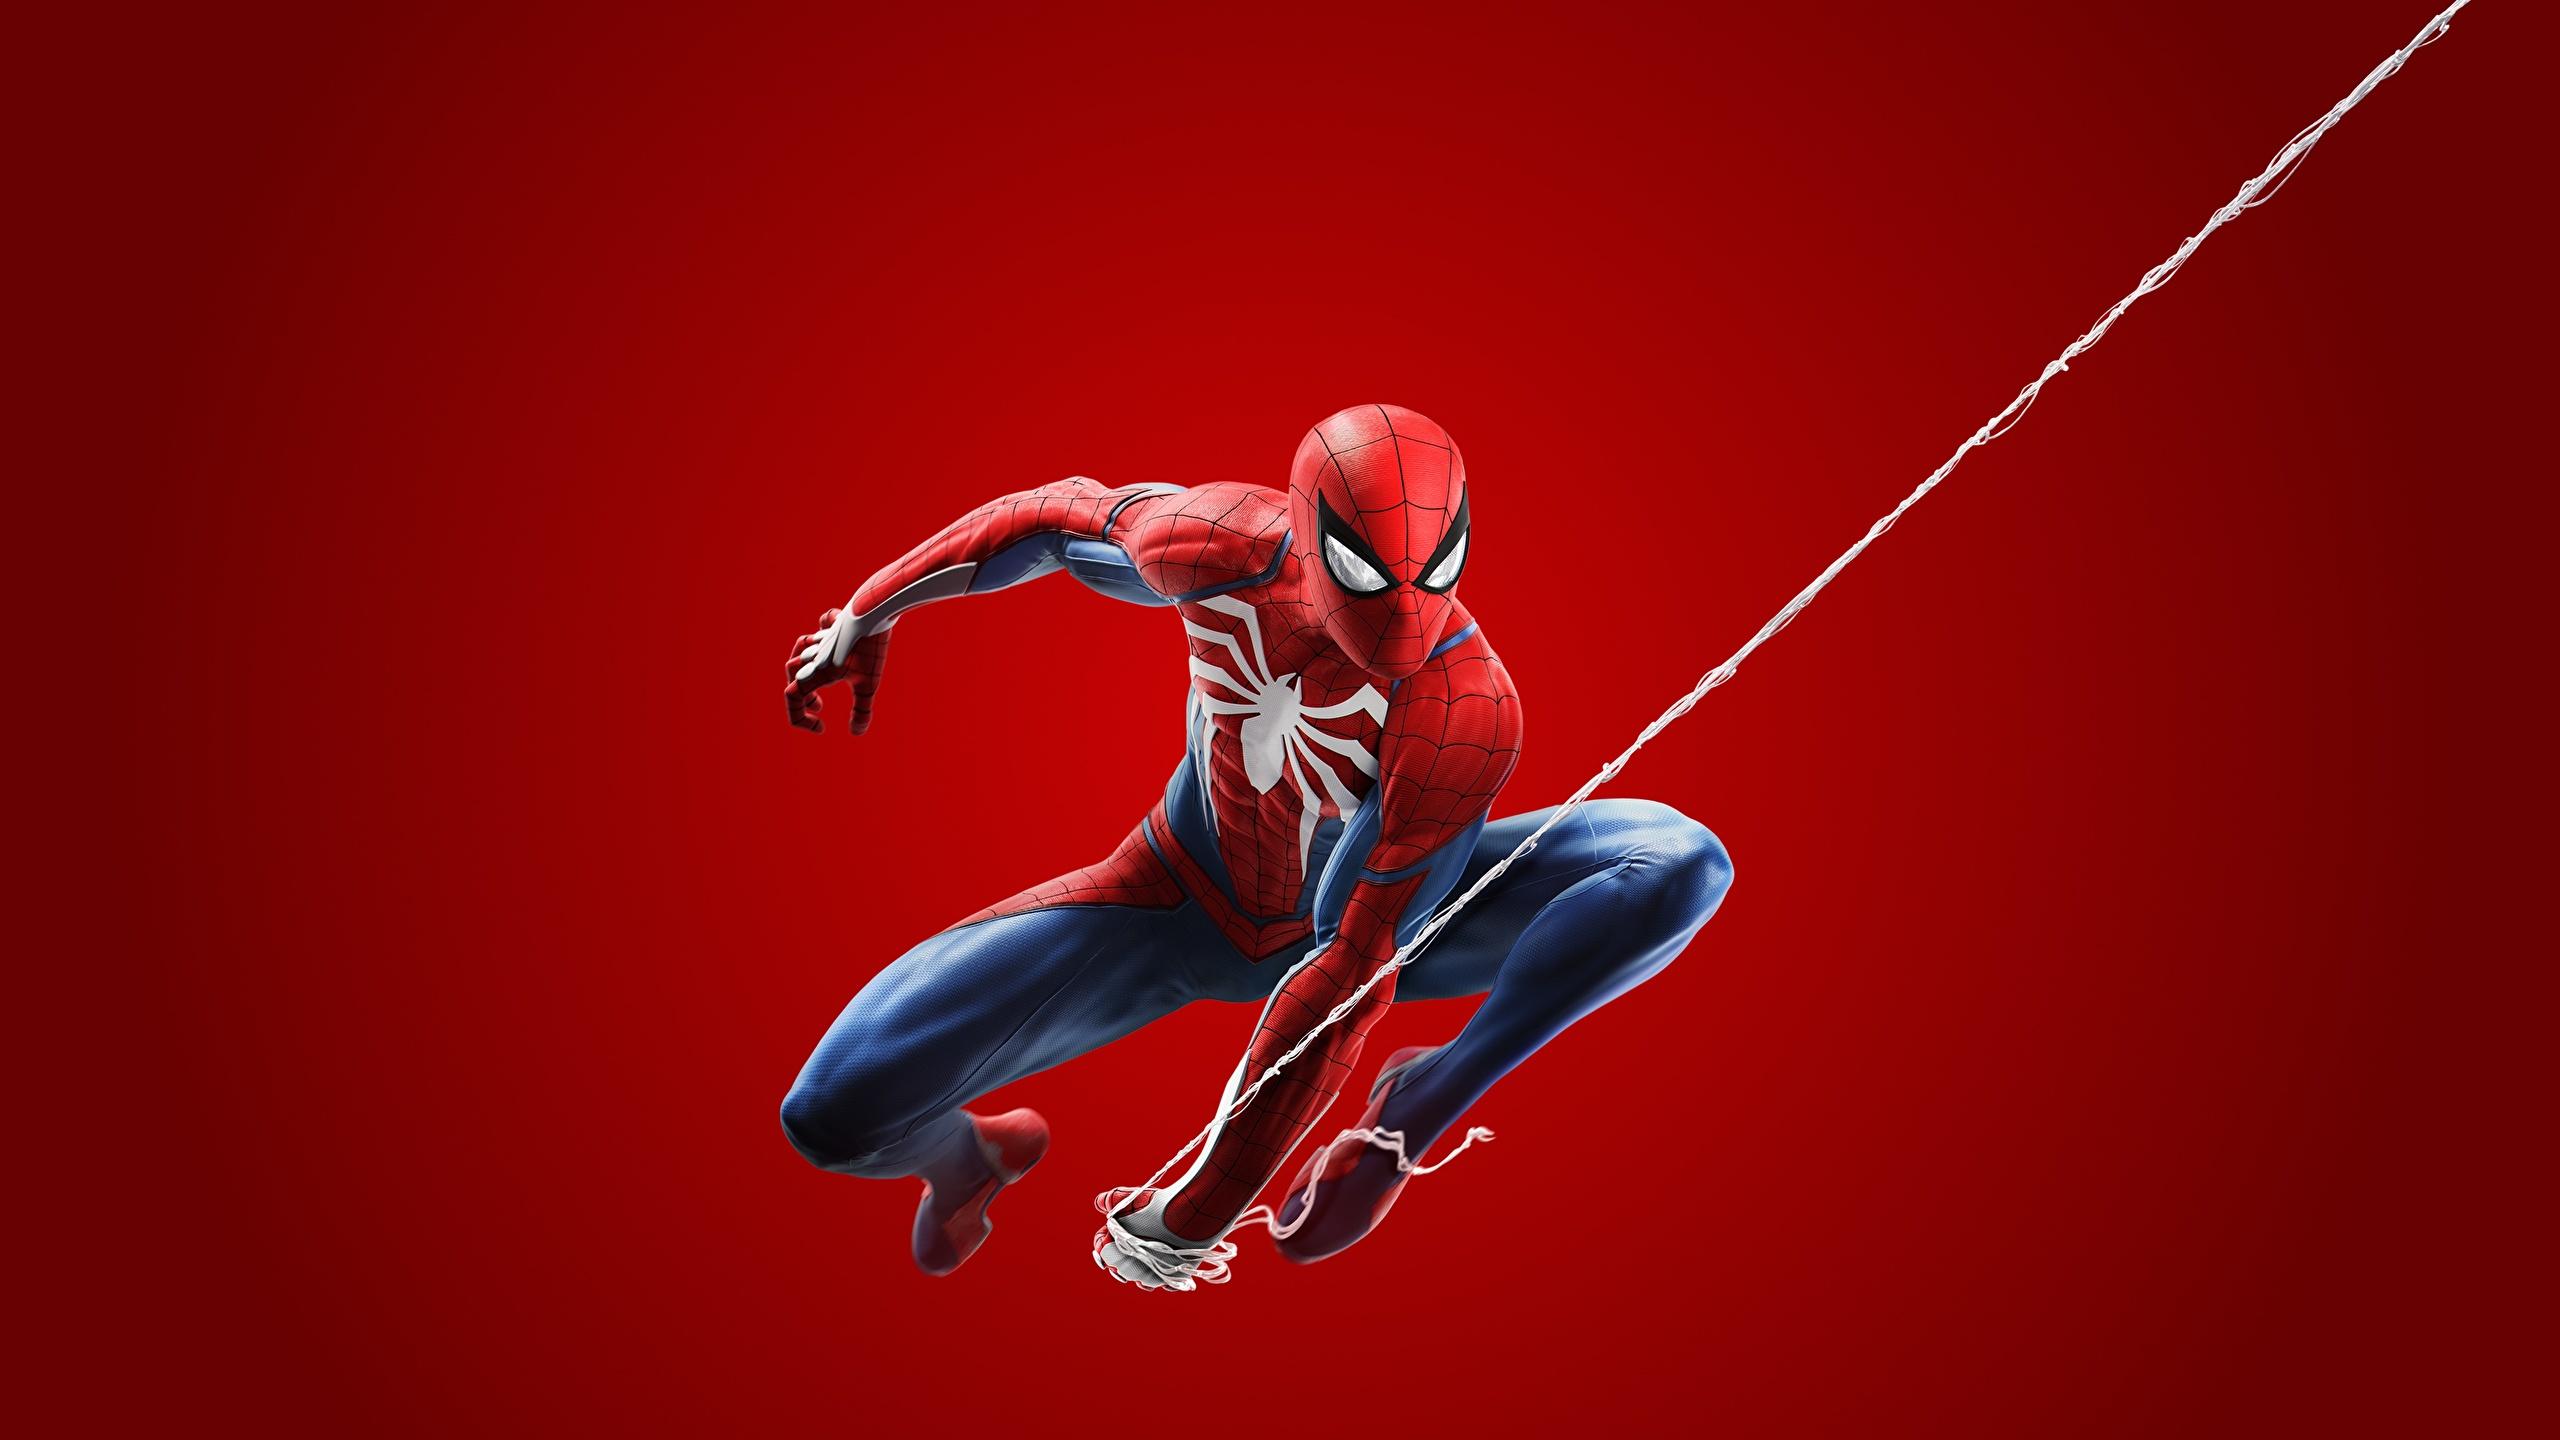 Переозвучка человек паук знакомство с колеками